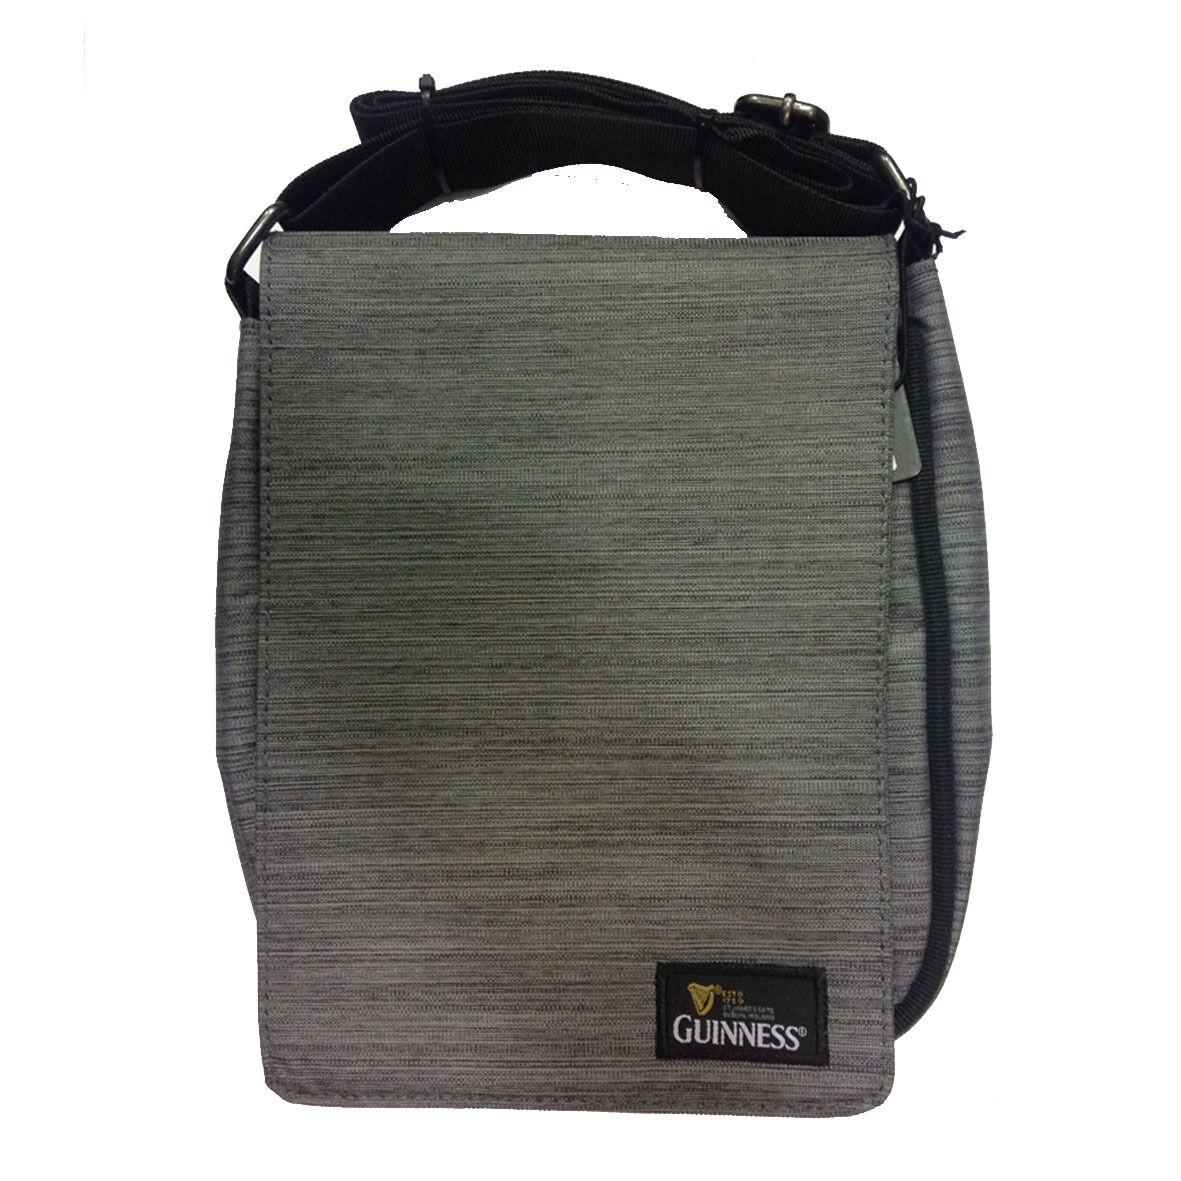 GUINNESS marsupio tracolla regolabile in stoffa grigio melange 2 tasche 24x19x4